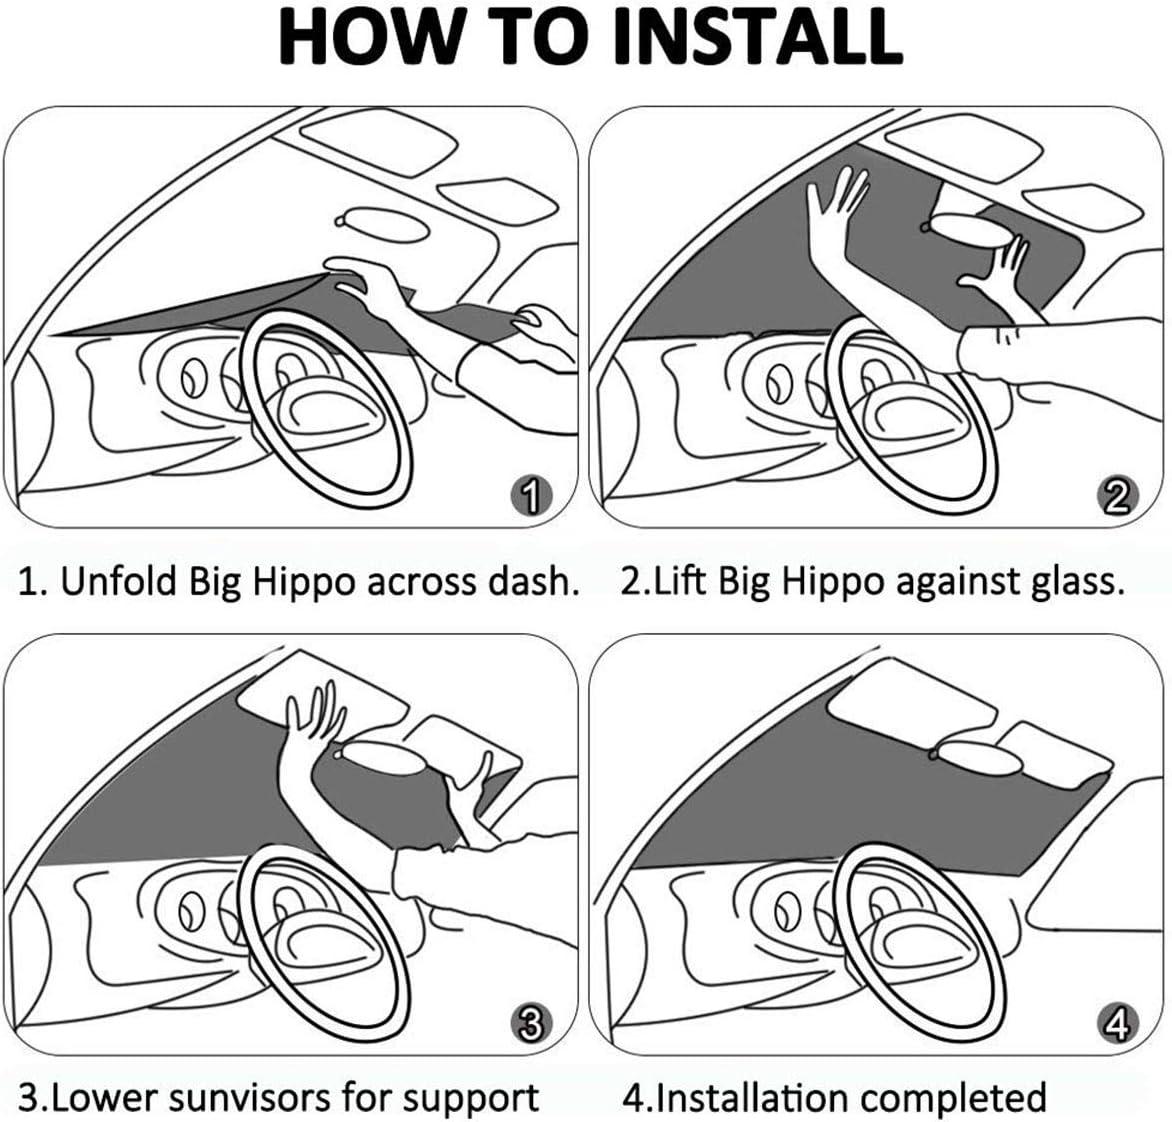 TOLUYOQU Beauty Within The Beast Car Windshield Sunshade Folding Sun Visor Protector Blocks Heat and Sun Keep Your Vehicle Cool